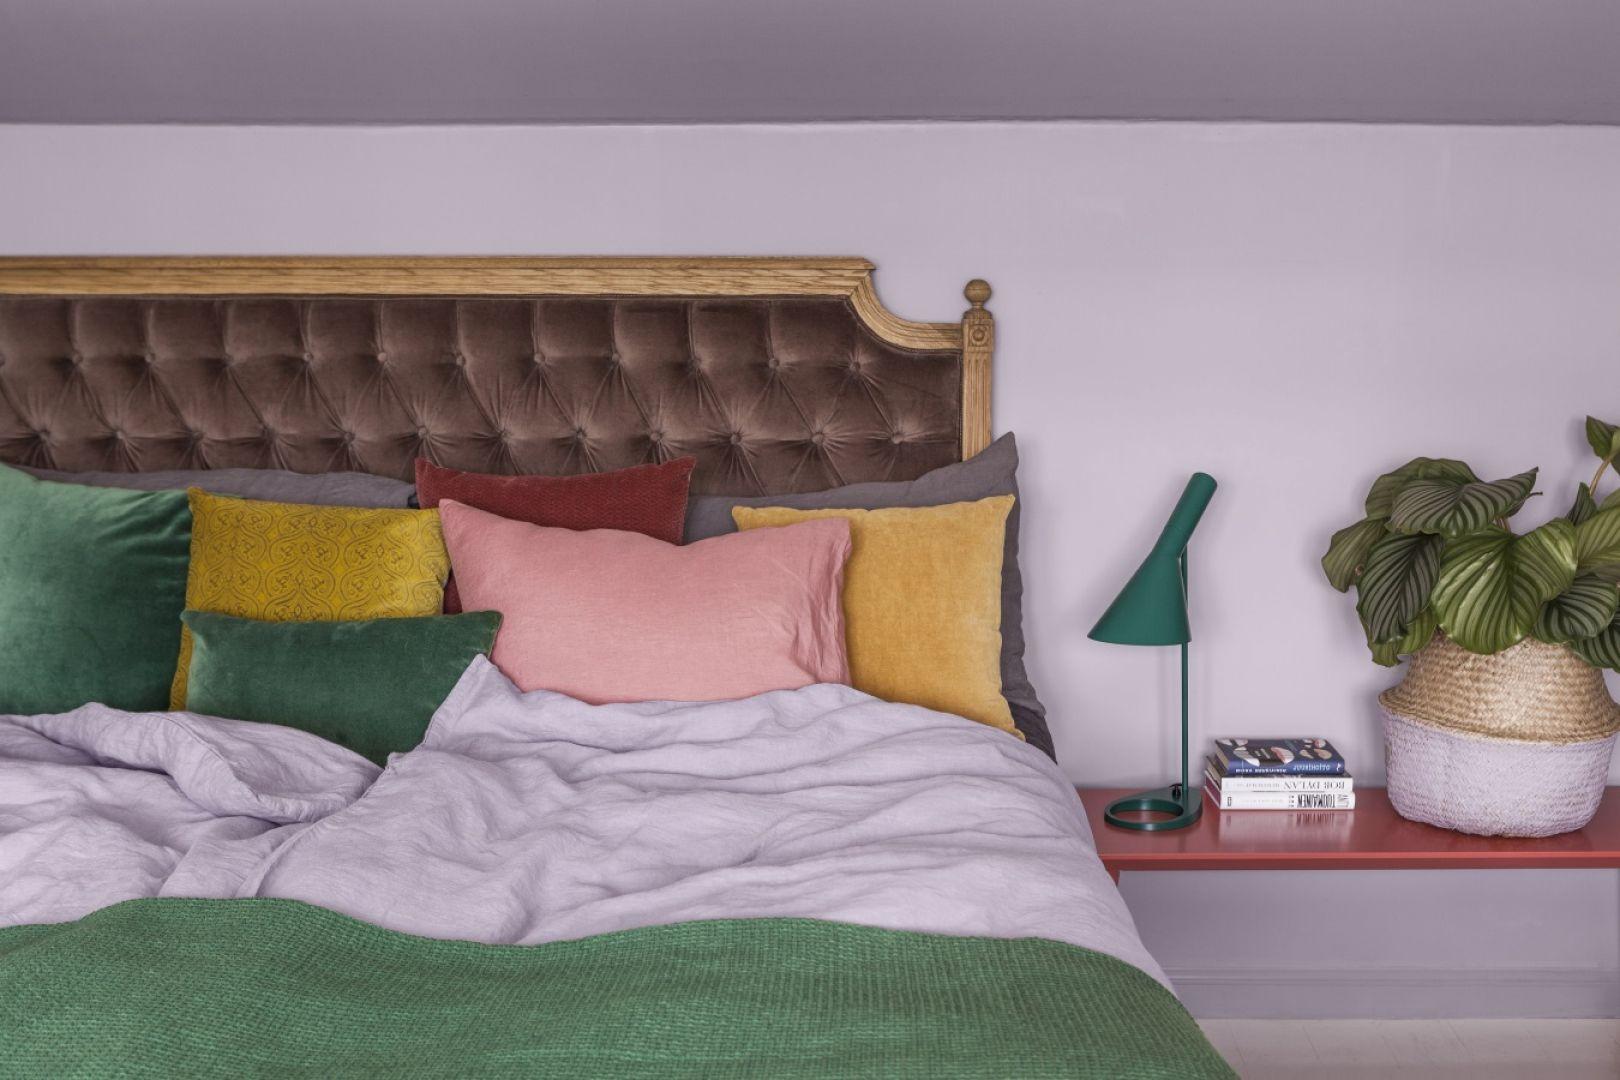 Wnętrza w modnej, kwiatowej oprawie: ściana - Tikkurila Optiva Ceramic Super Matt 3 kolor J426 Lilac; stolik - Tikkurila Everal Aqua Semi Matt 40.  Fot. Tikkurila